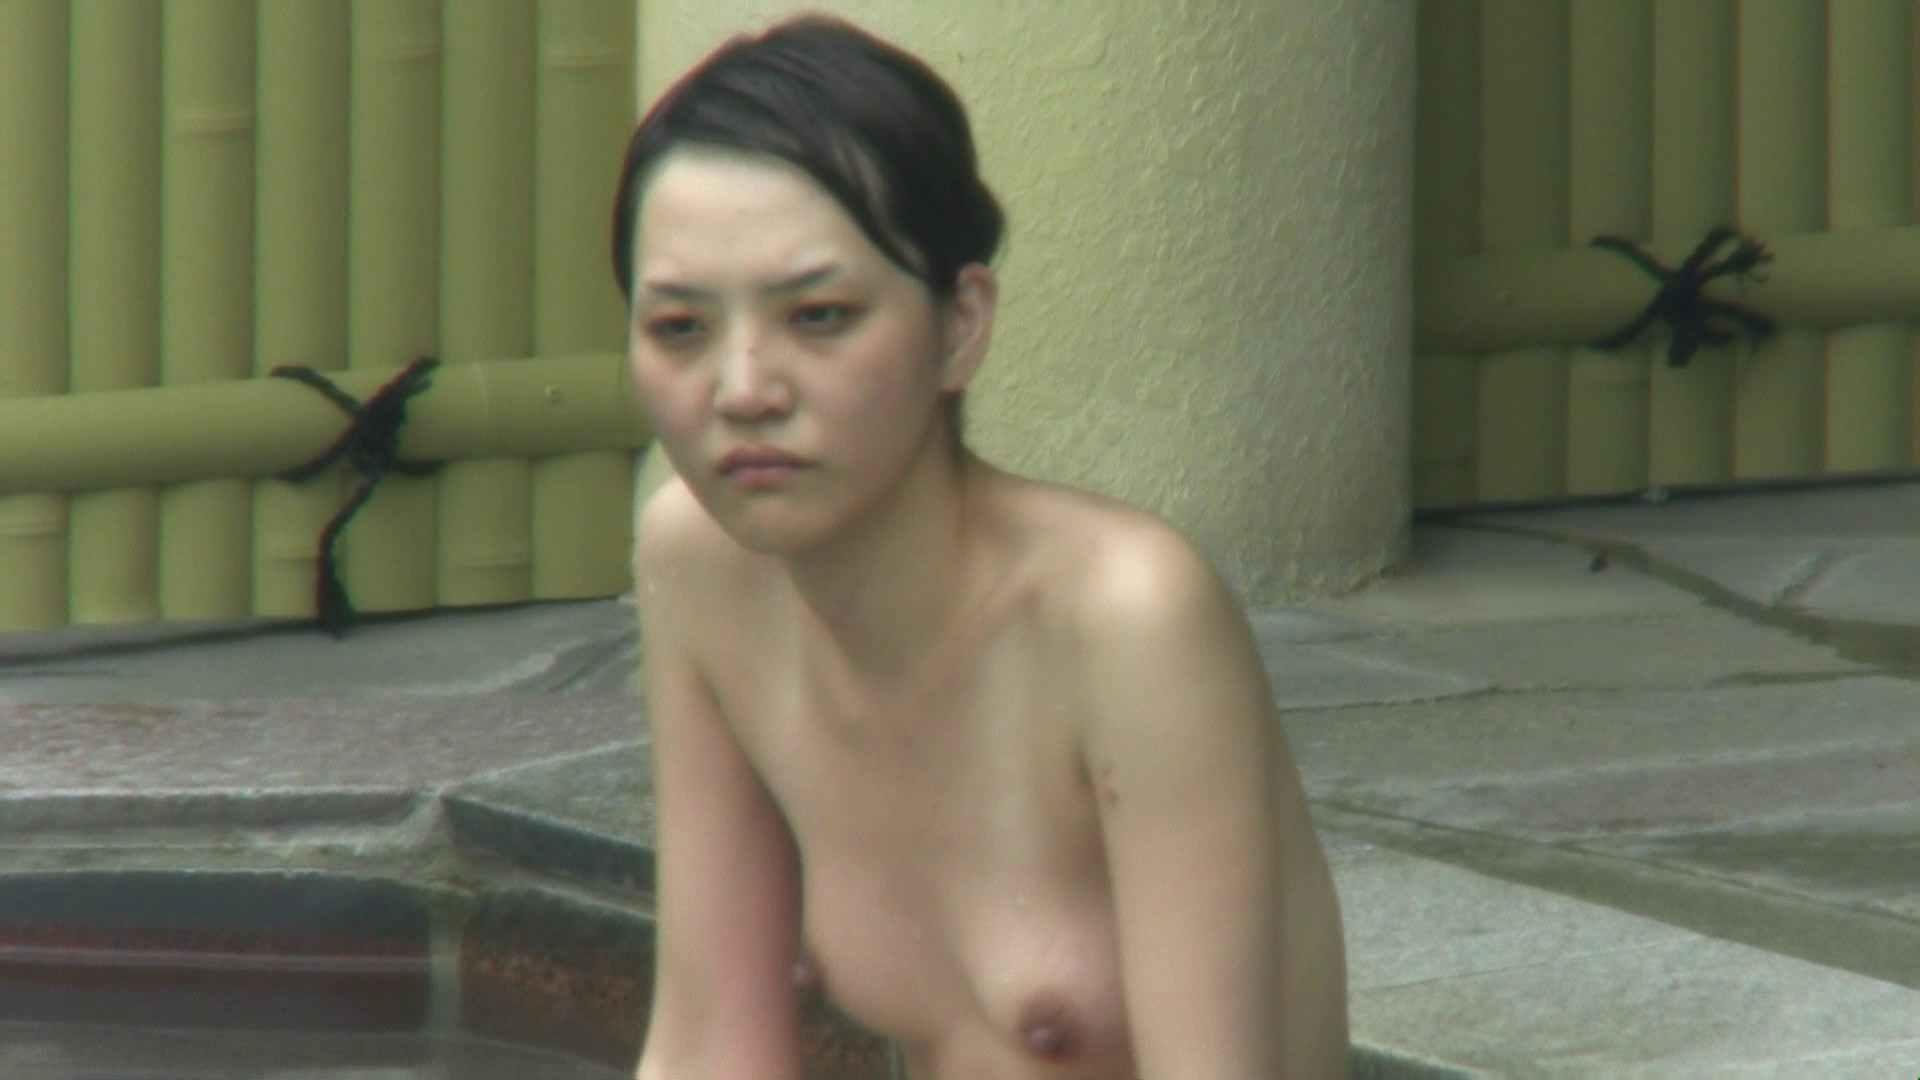 Aquaな露天風呂Vol.64【VIP限定】 露天風呂編 | 盗撮シリーズ  78PIX 7